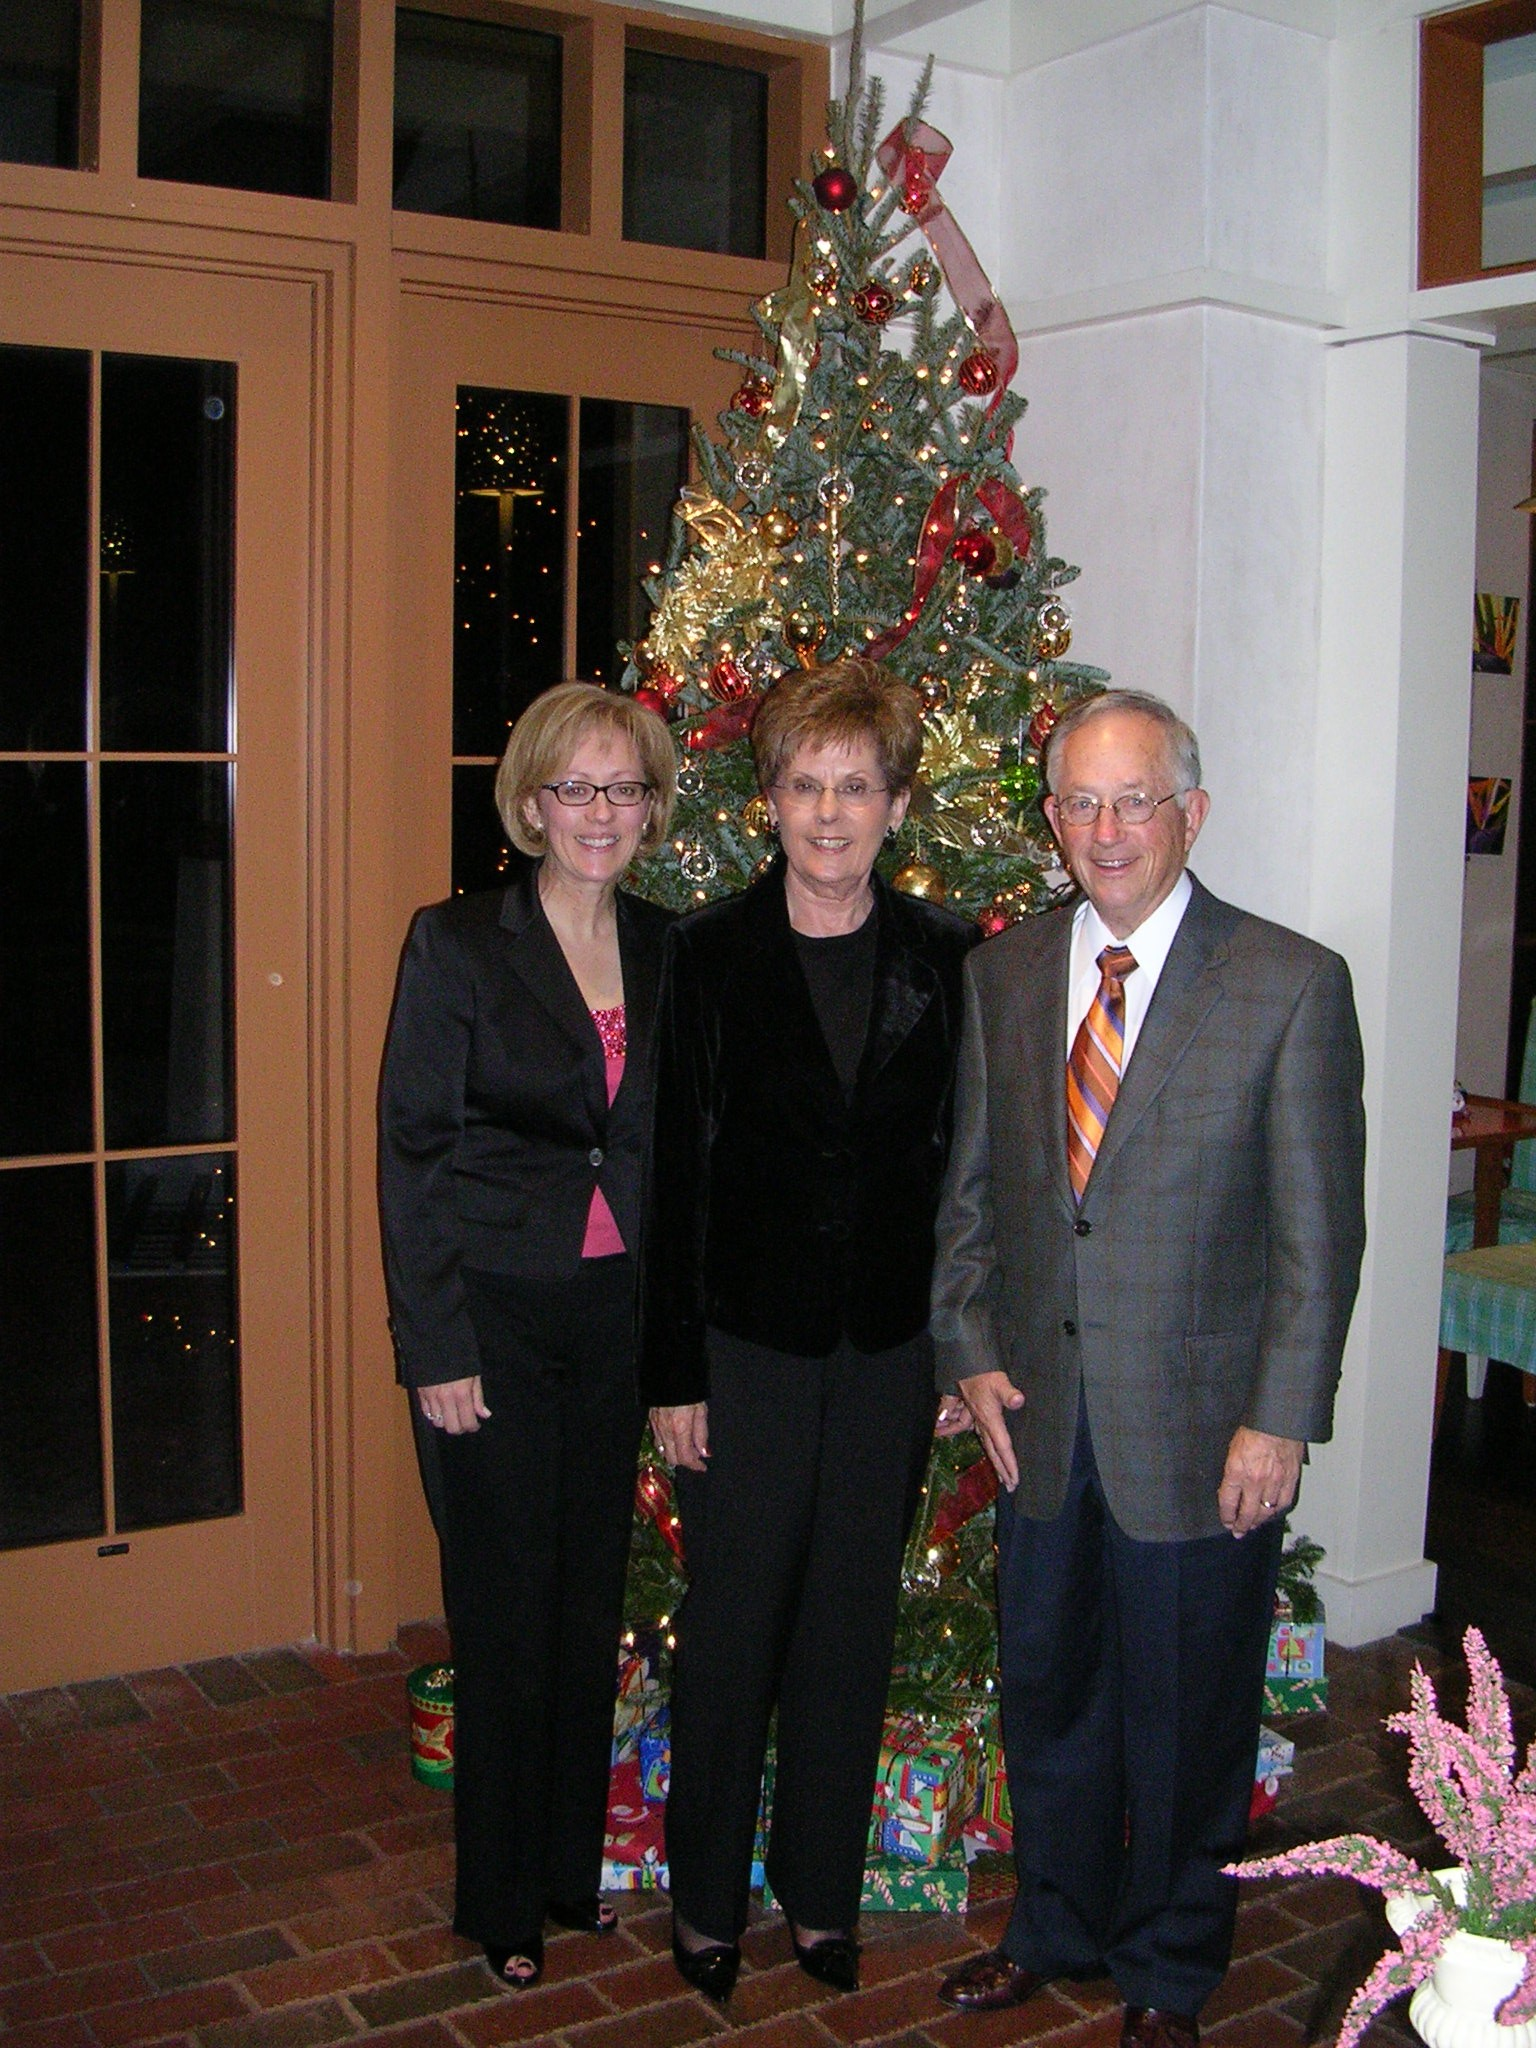 From left to right: Peri Widener, Luanne Widener and Wayne Widener